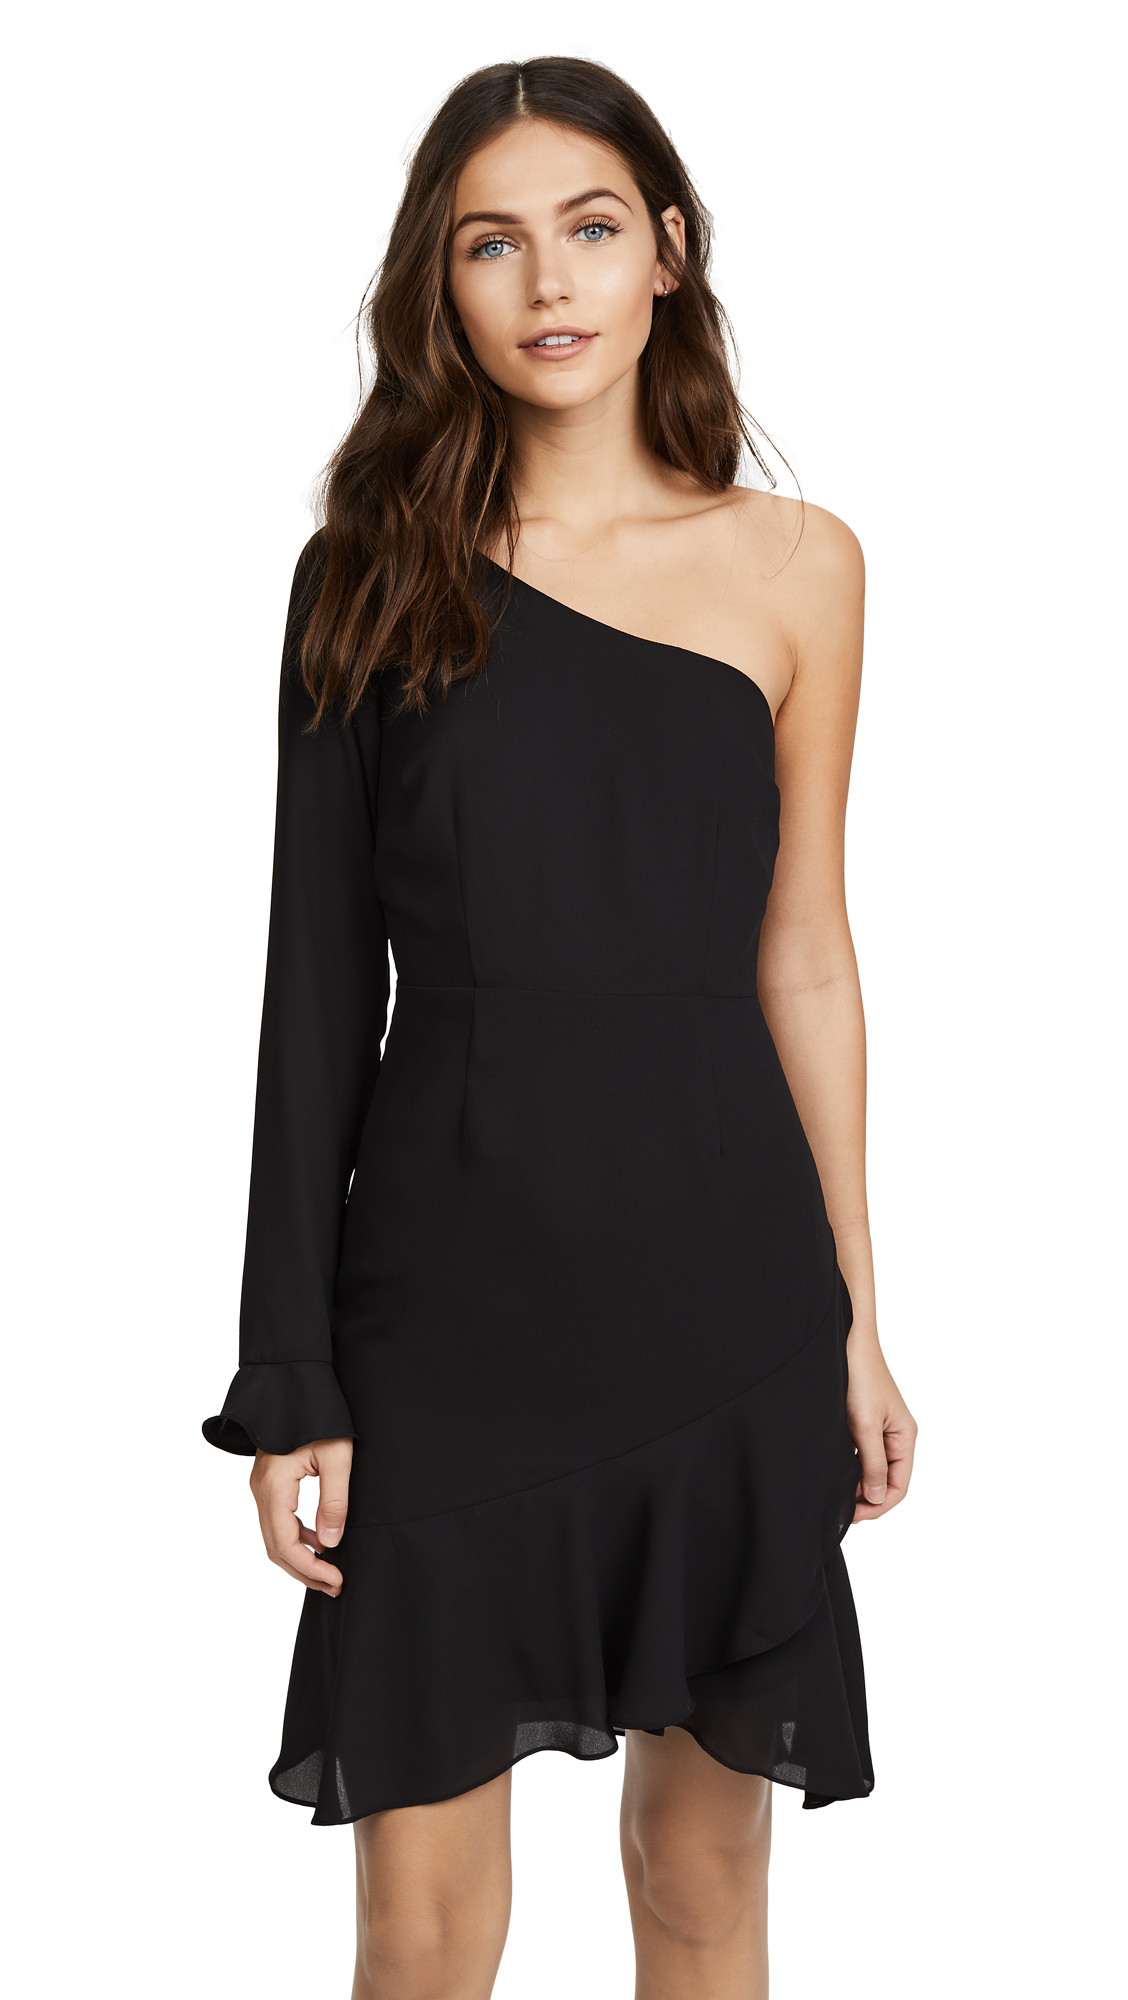 LIKELY Remington Dress